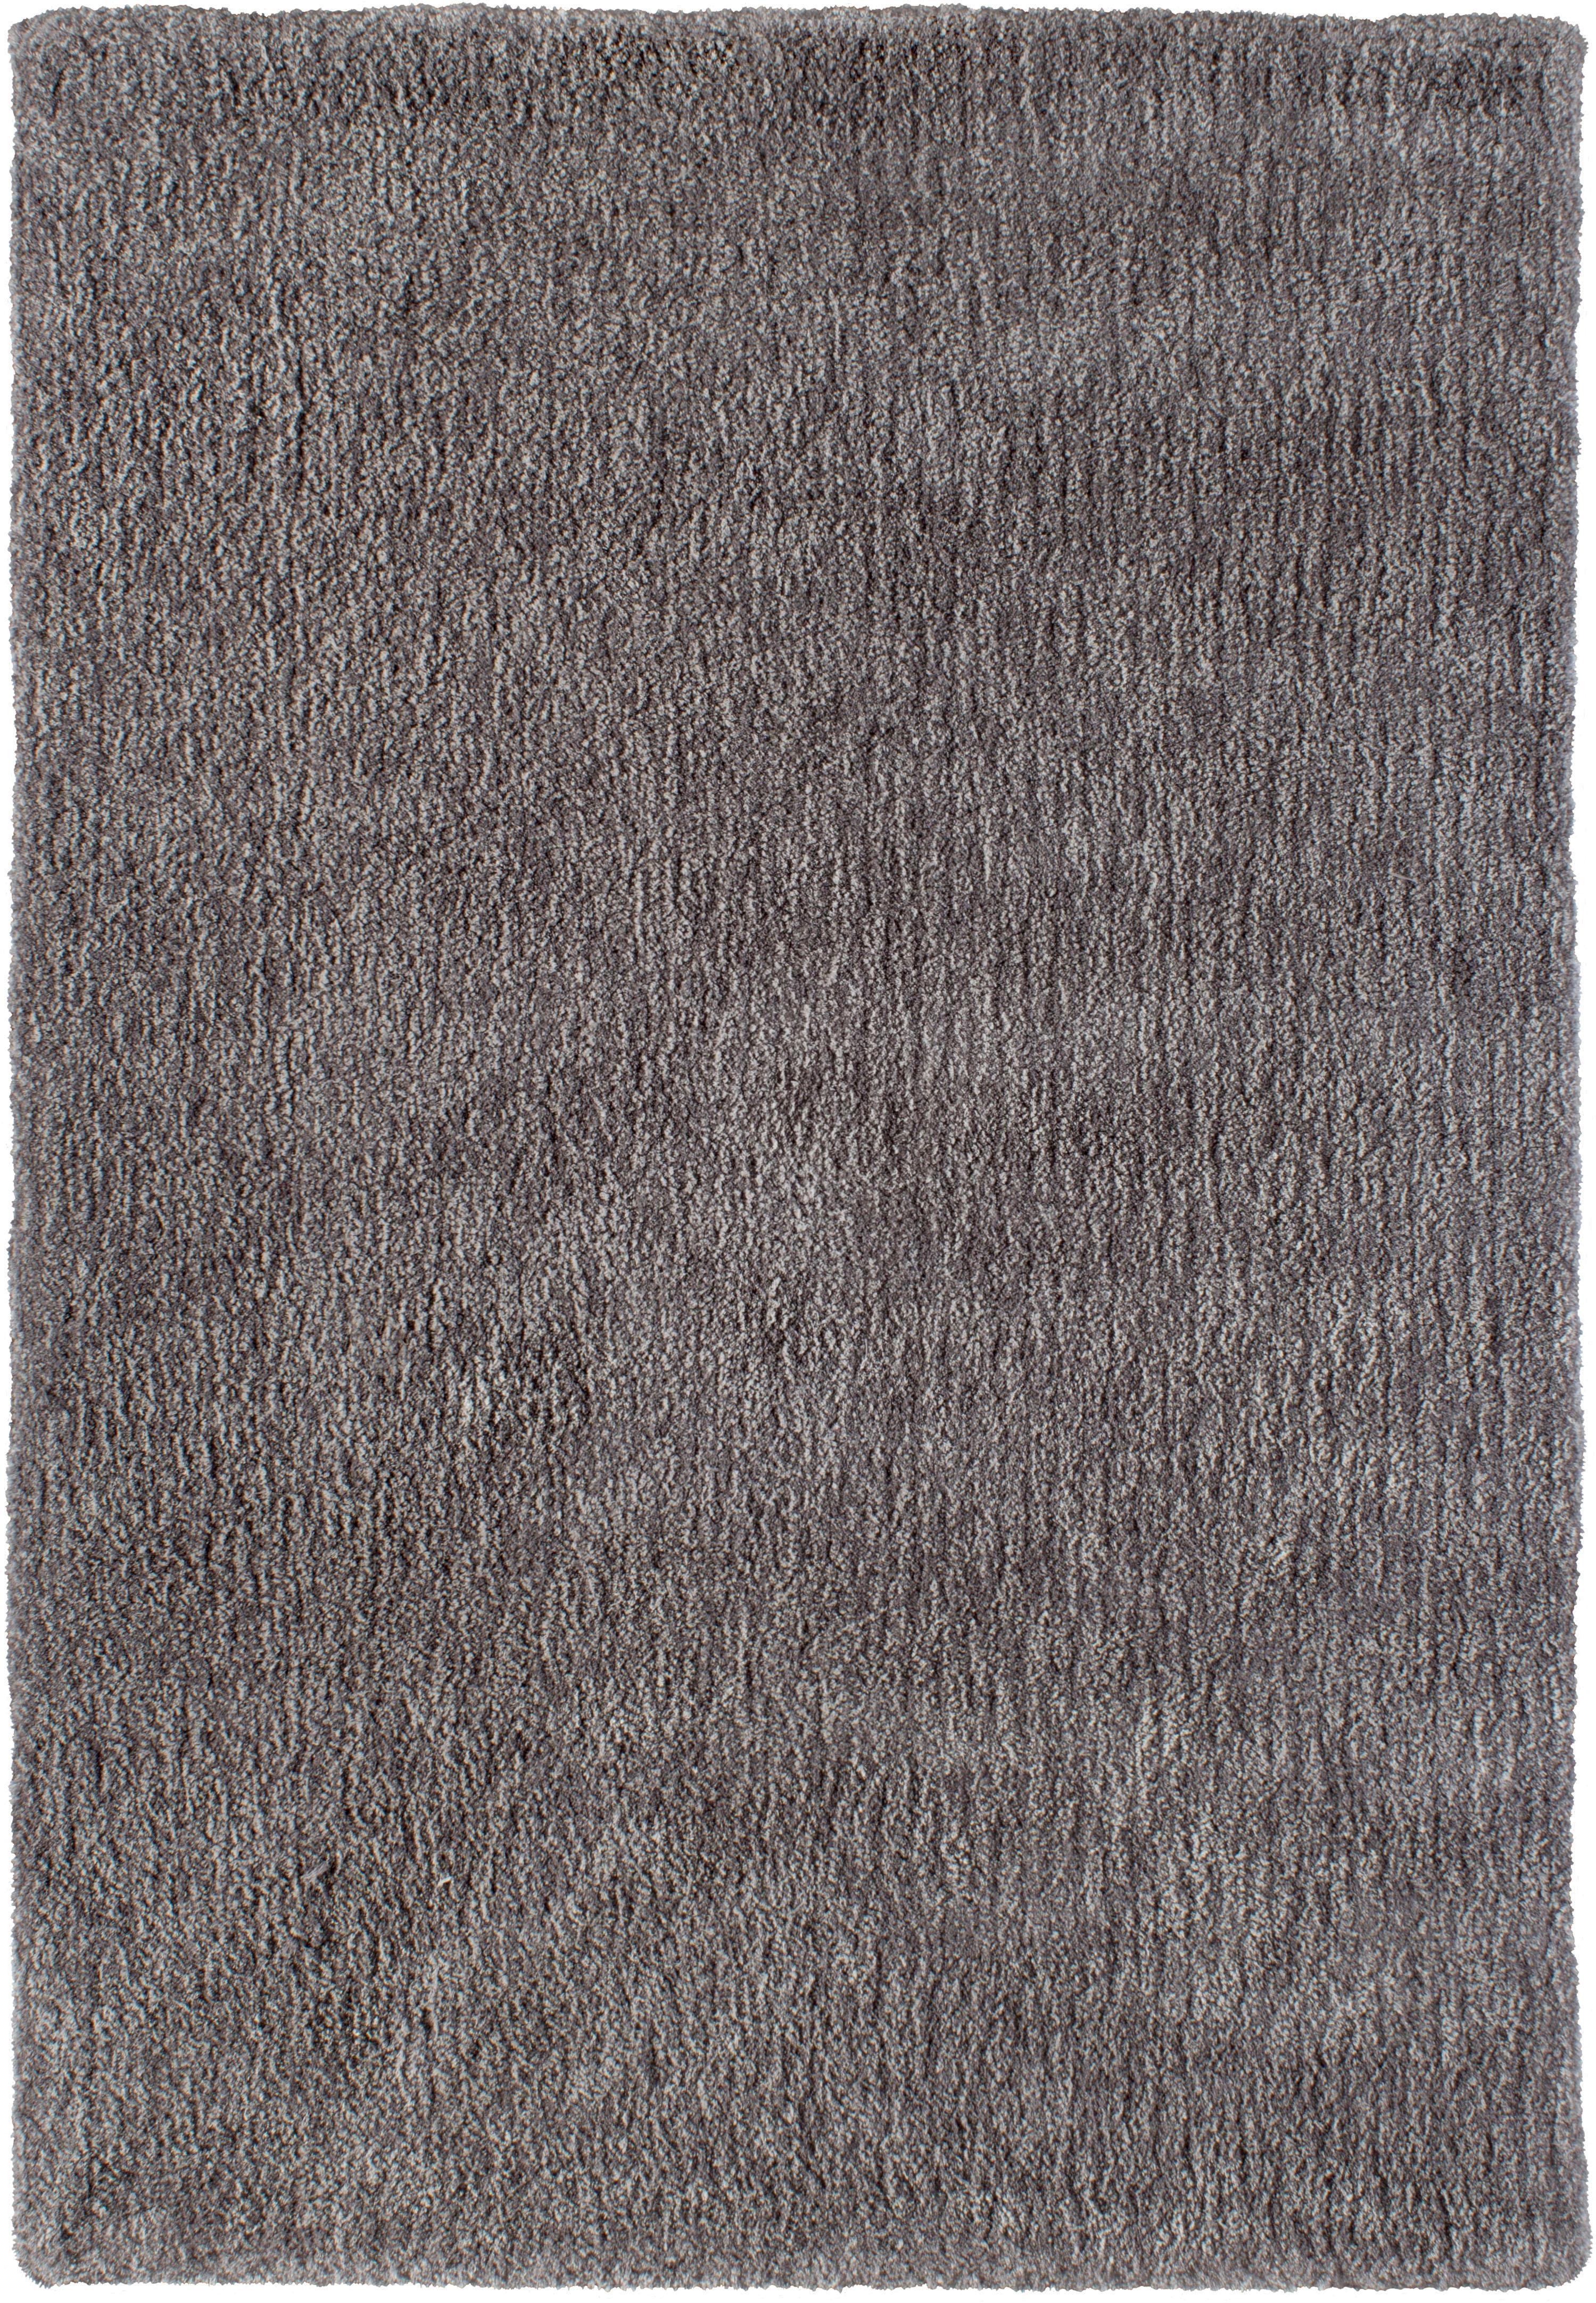 Hochflor-Teppich, »Touch«, Barbara Becker, rechteckig, Höhe 27 mm, handgetuftet   Heimtextilien > Teppiche > Hochflorteppiche   Braun   barbara becker